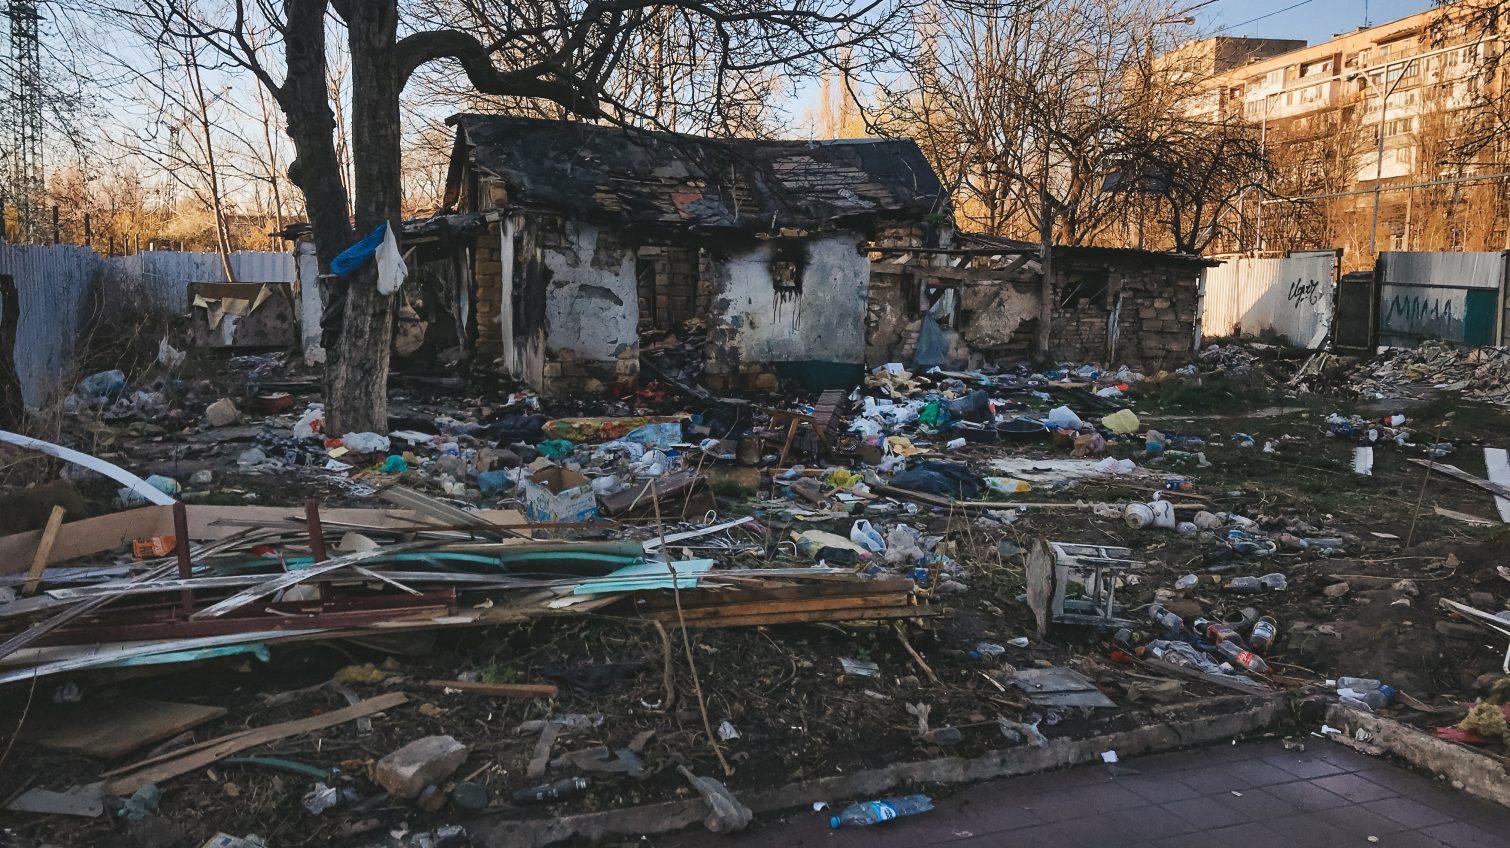 «Жизнь на Манхэттене»: на площади Толбухина горы мусора из-за стройки (фоторепортаж) «фото»